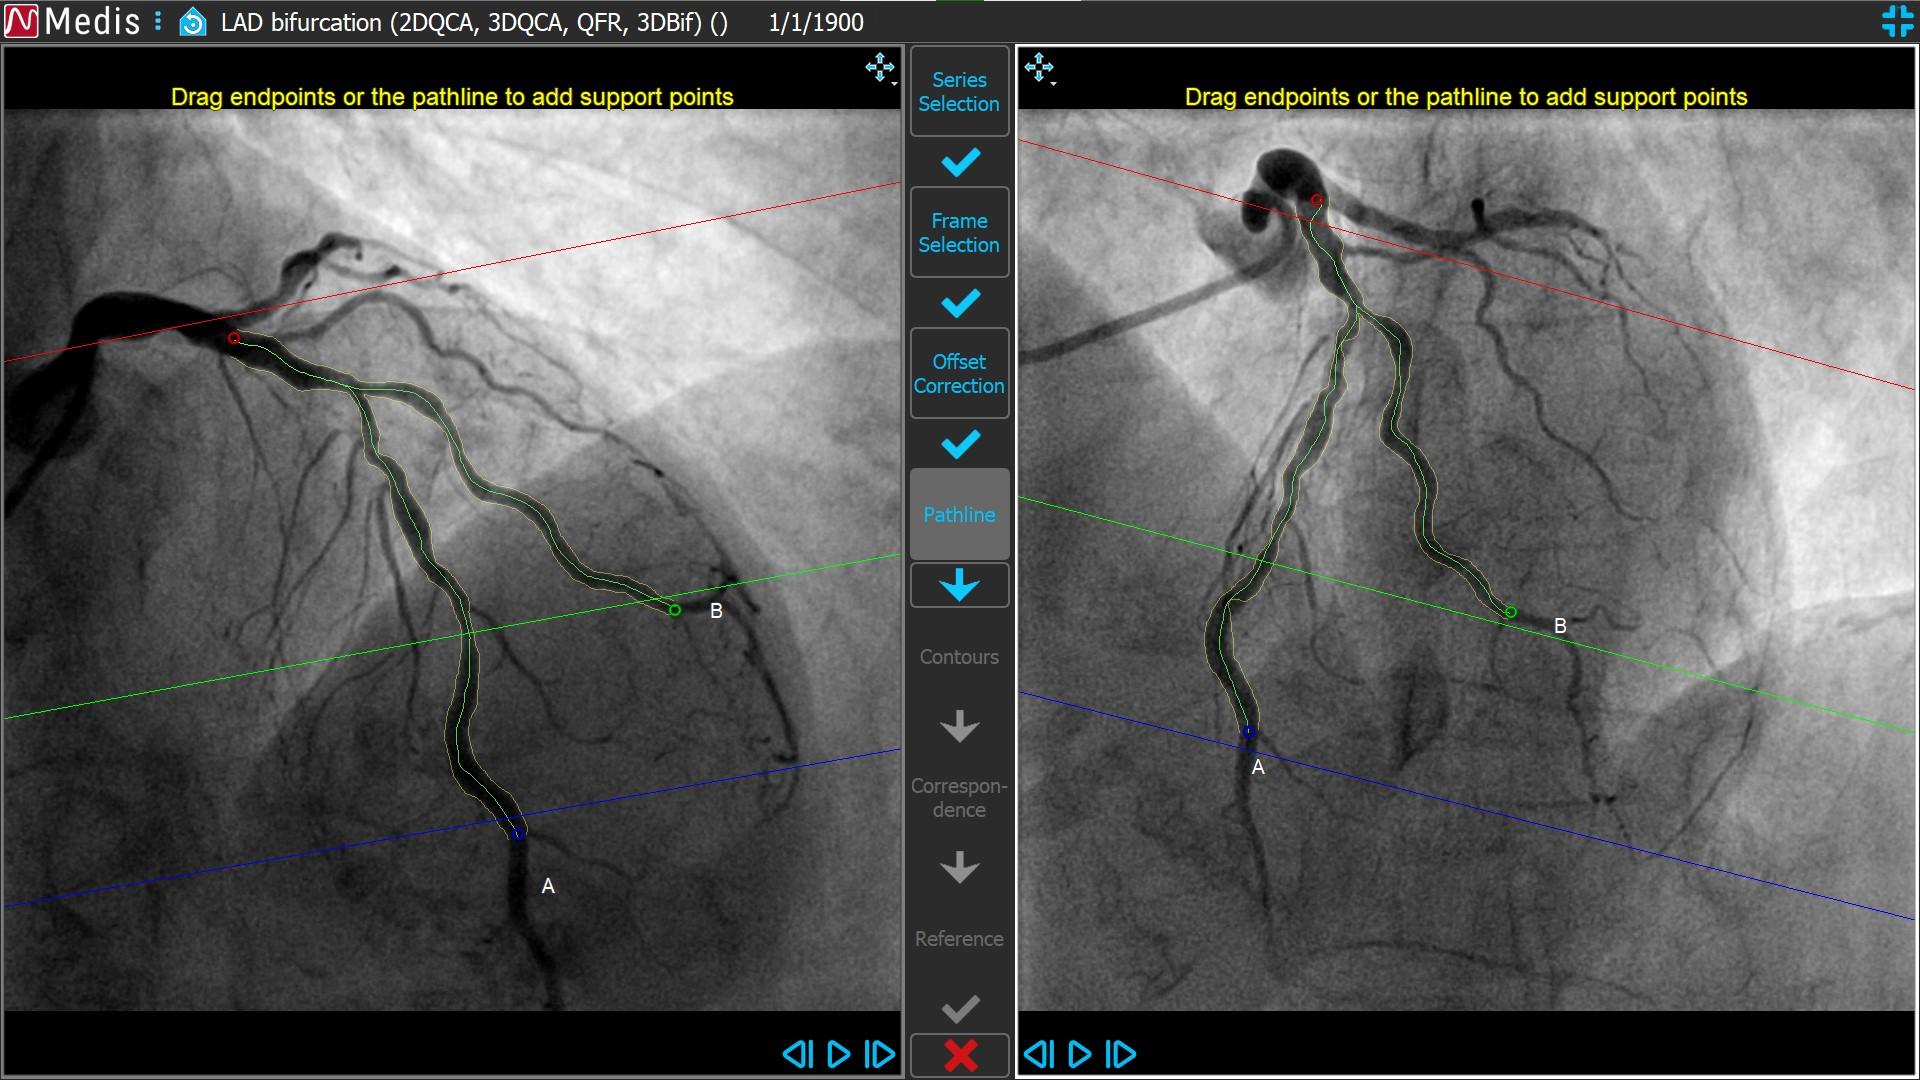 Medis Suite XA 3D QCA Bifurcation4 4 Pathline